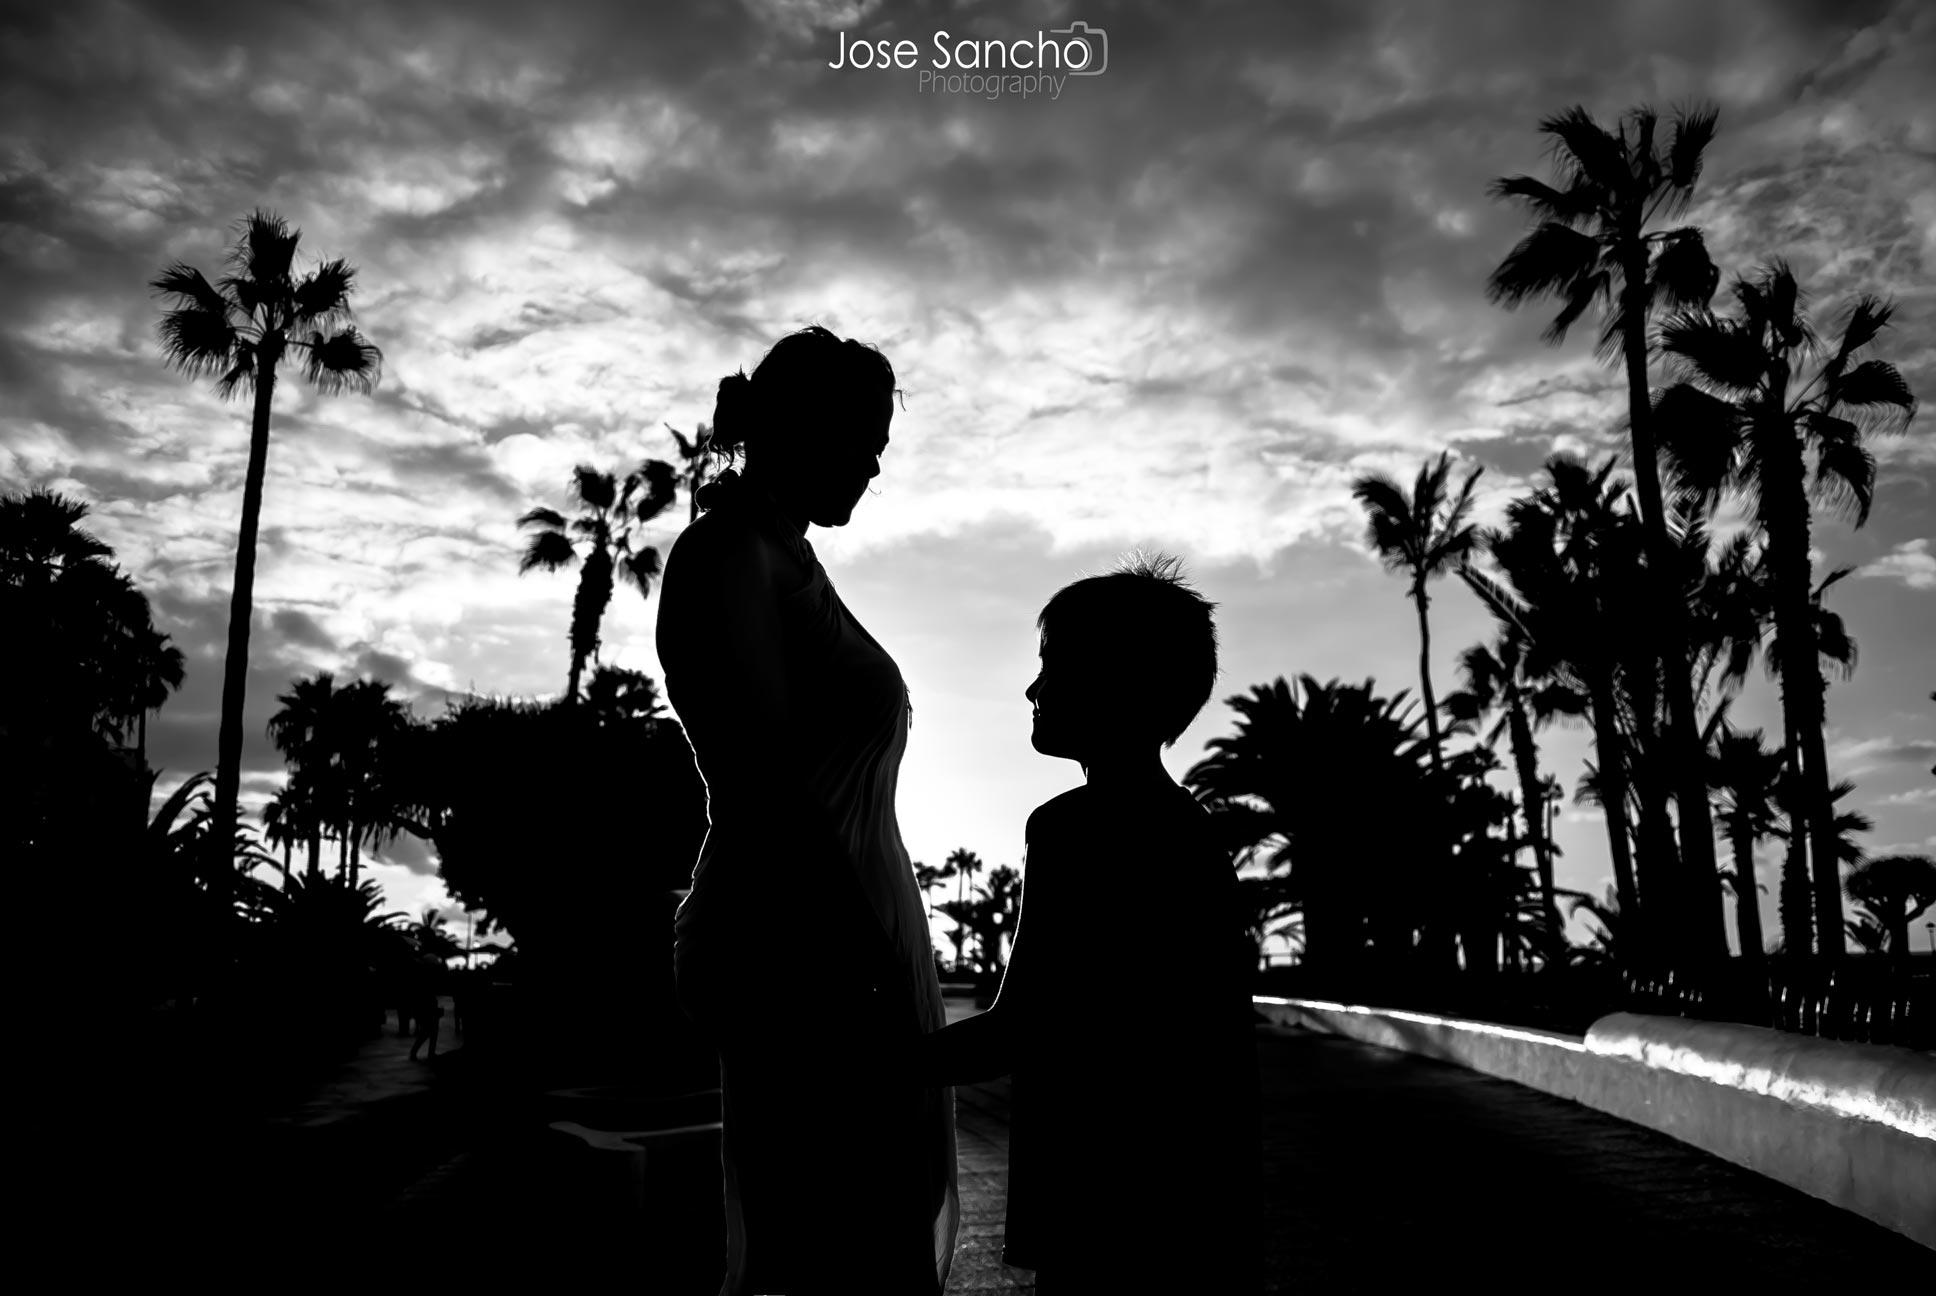 Jaime y Romy - Jose Sancho Photography